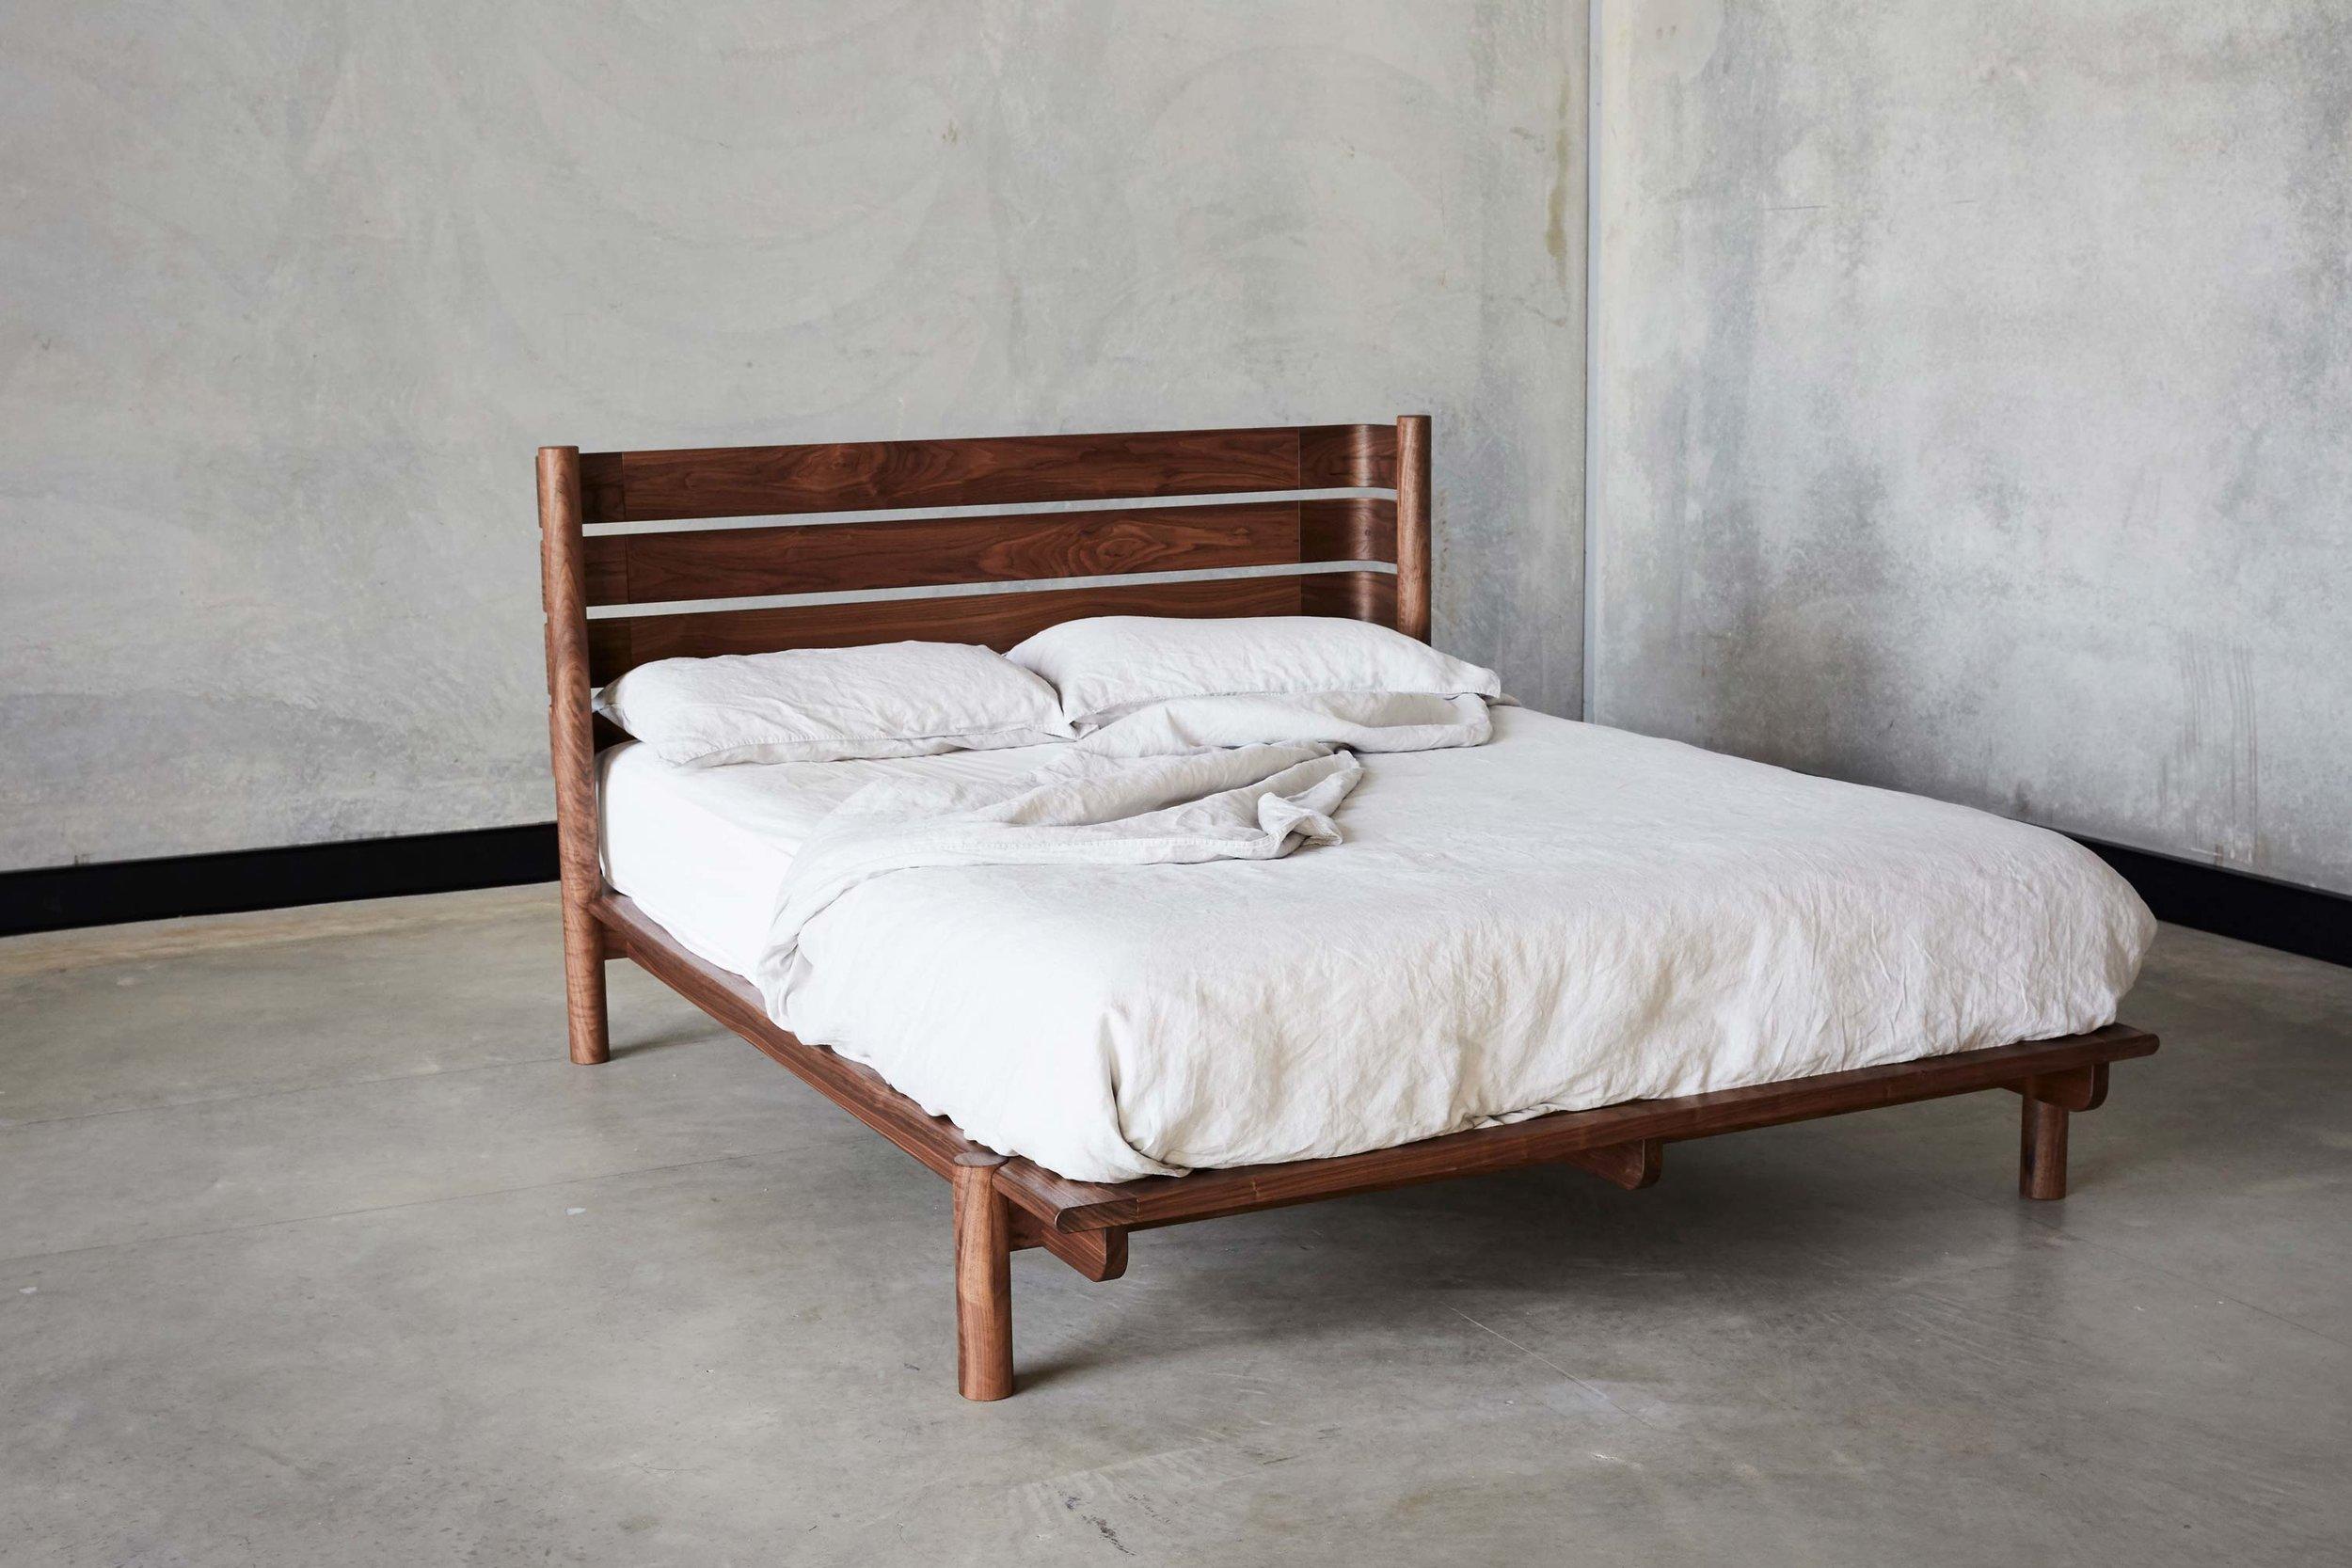 Title Bed 03 by Mast Furniture. Modern, handmade furniture.